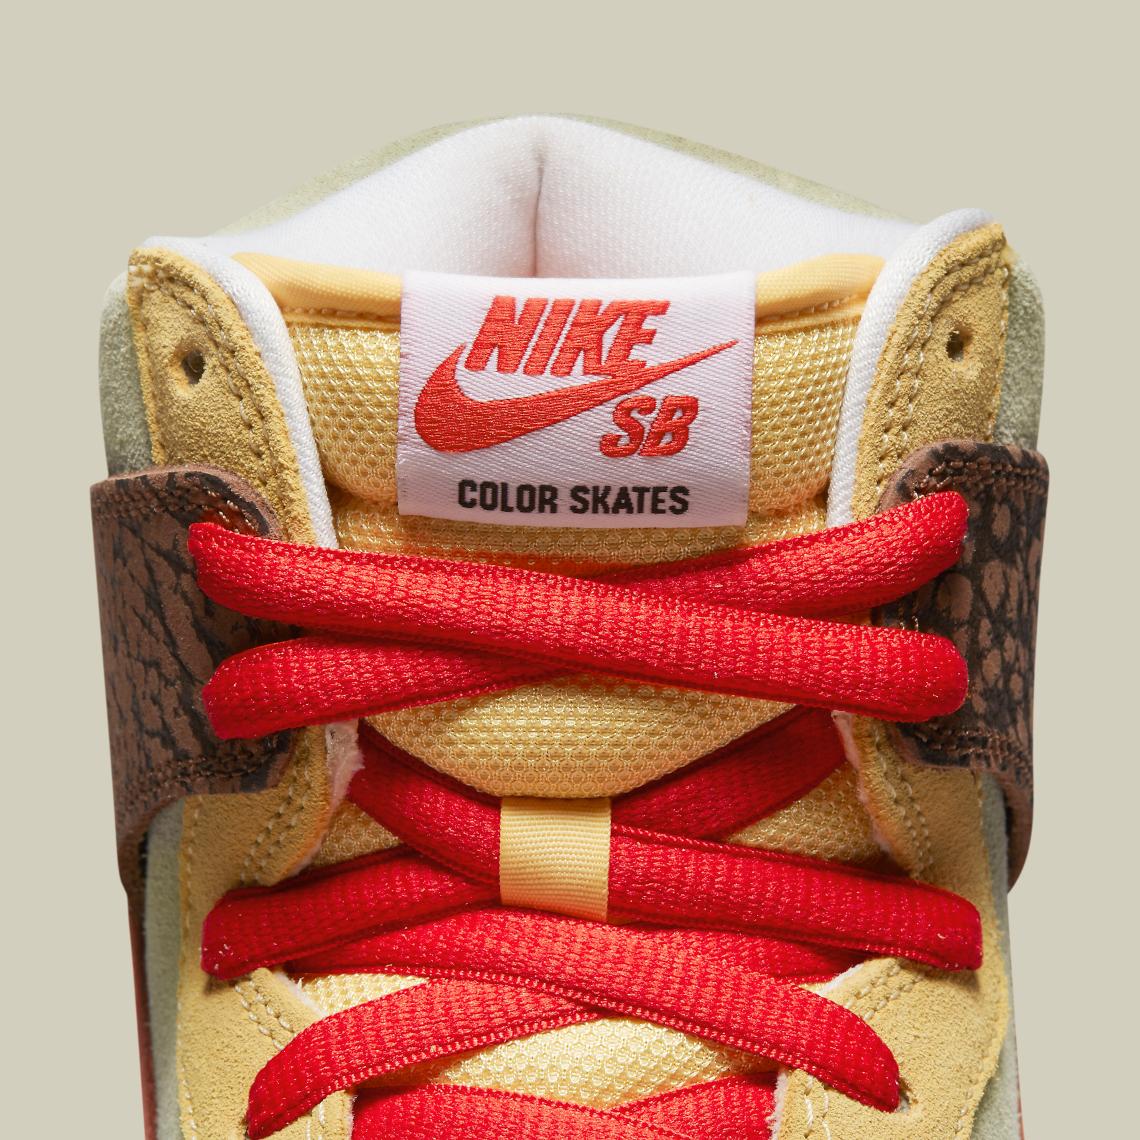 Nike-SB-Dunk-High-CZ2205-700-Color-Skates-CZ2205-700-6.jpg?w=1140